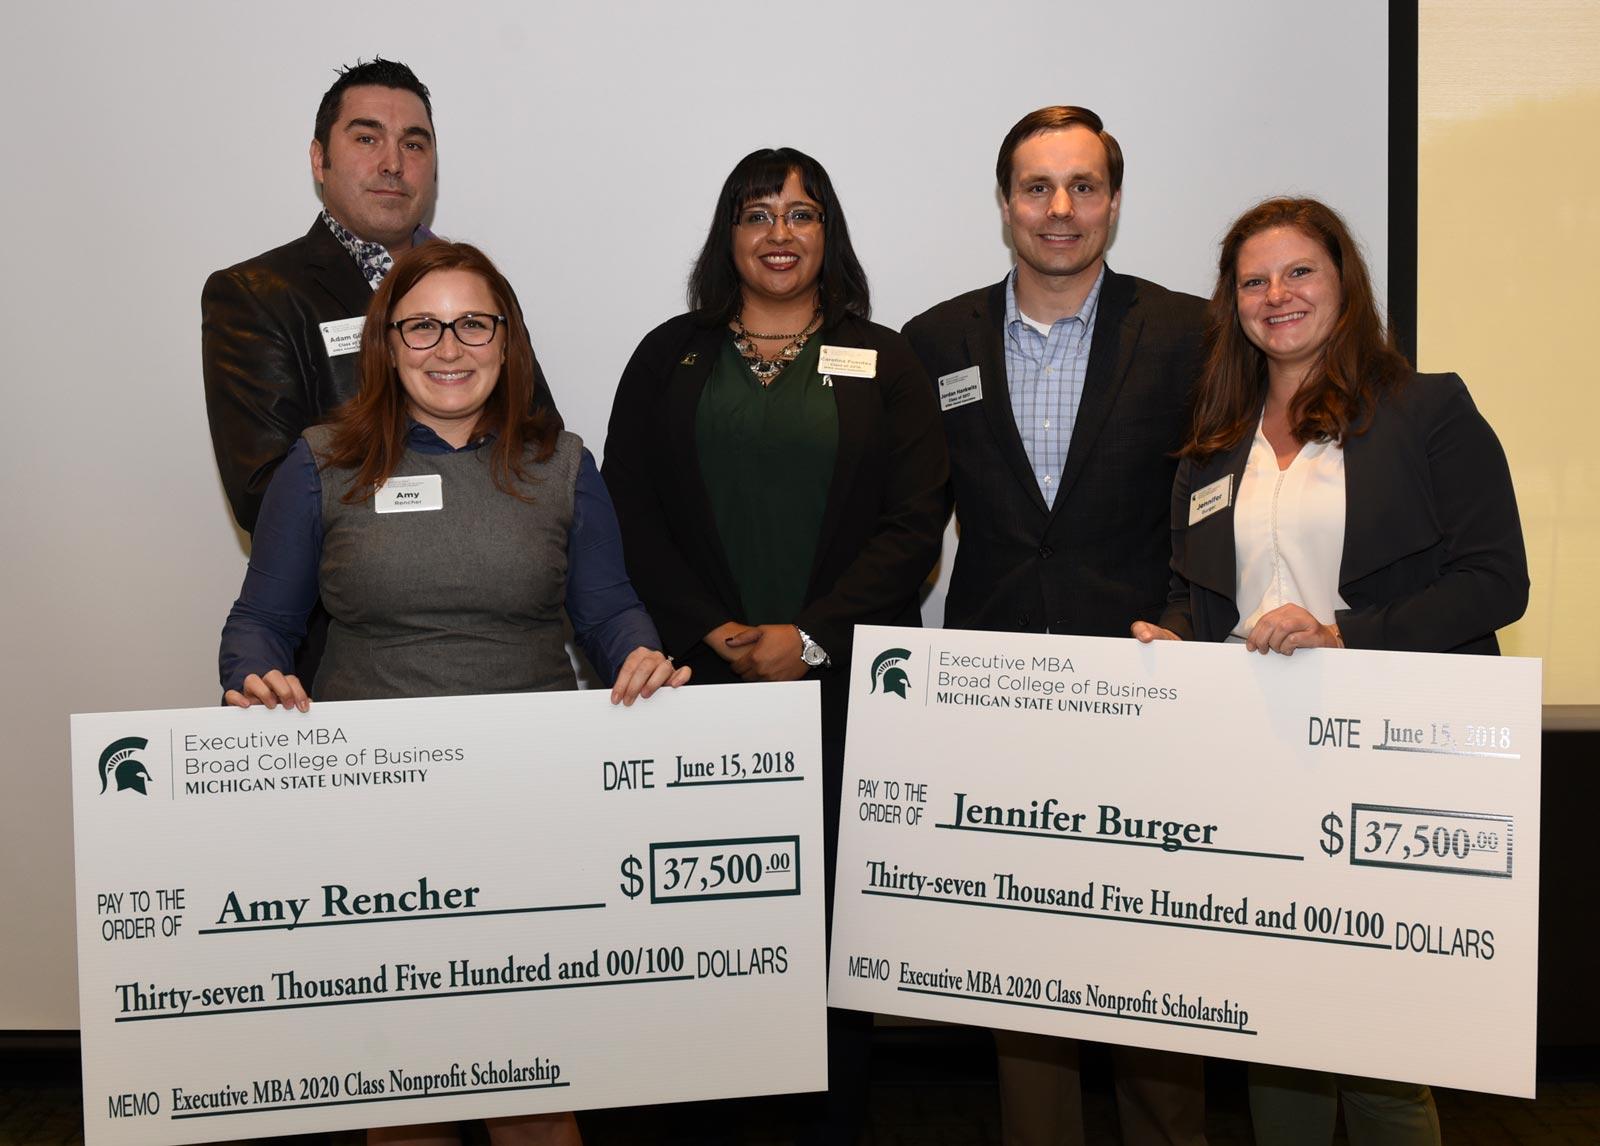 2018 Broad College of Business EMBA non-profit scholarship winners. Alumni Board Directors: Adam Gibbs, Carolina Fuentes, Jordan Hankwitz. Winners: Amy Rencher, Jennifer Burger.